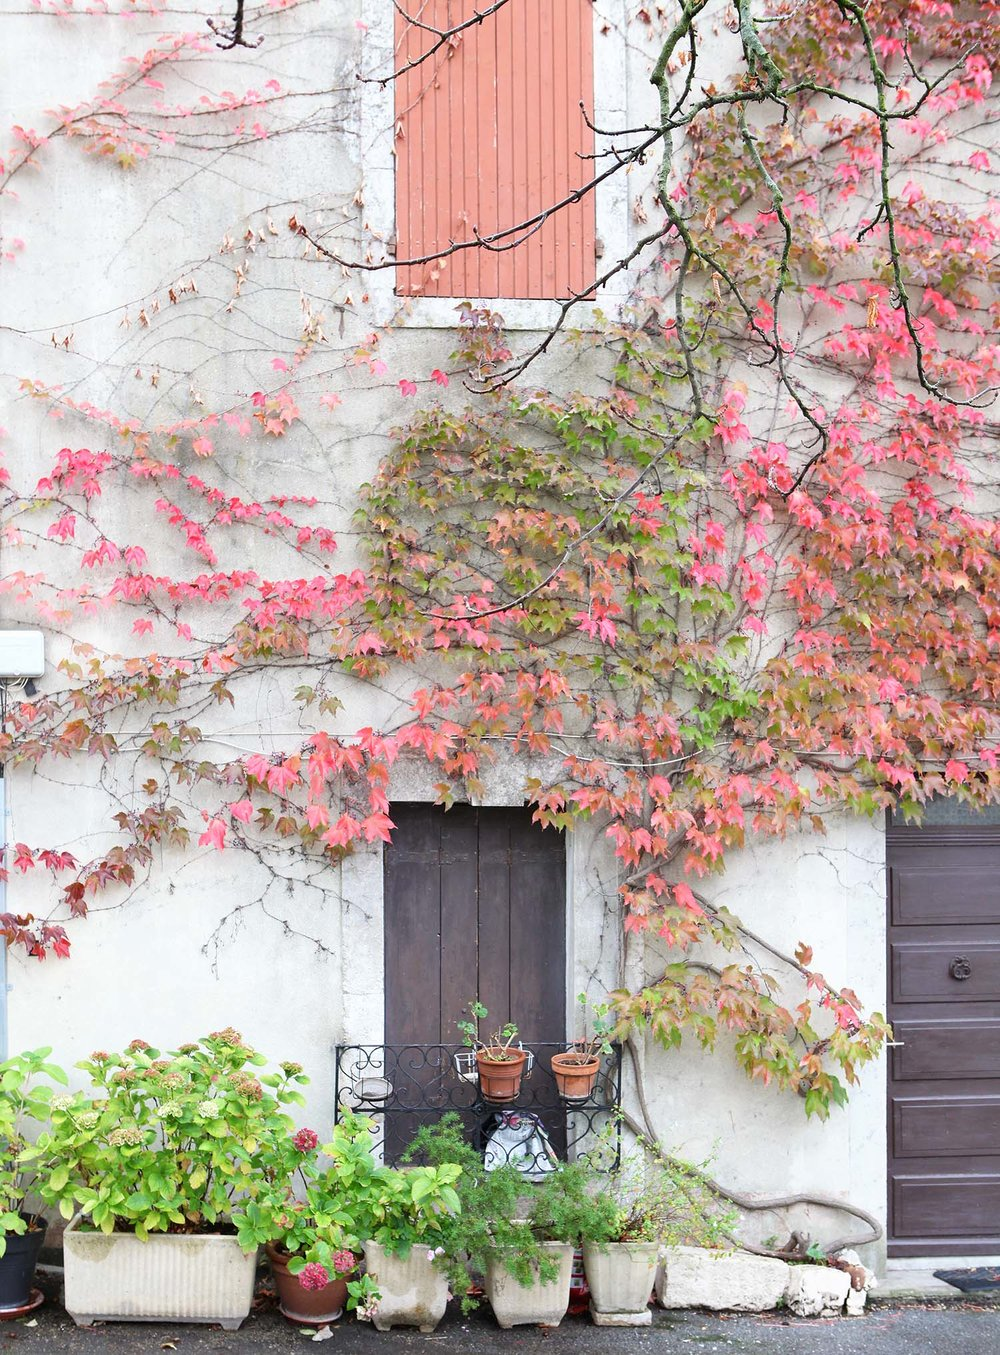 provence-fall-9.jpg